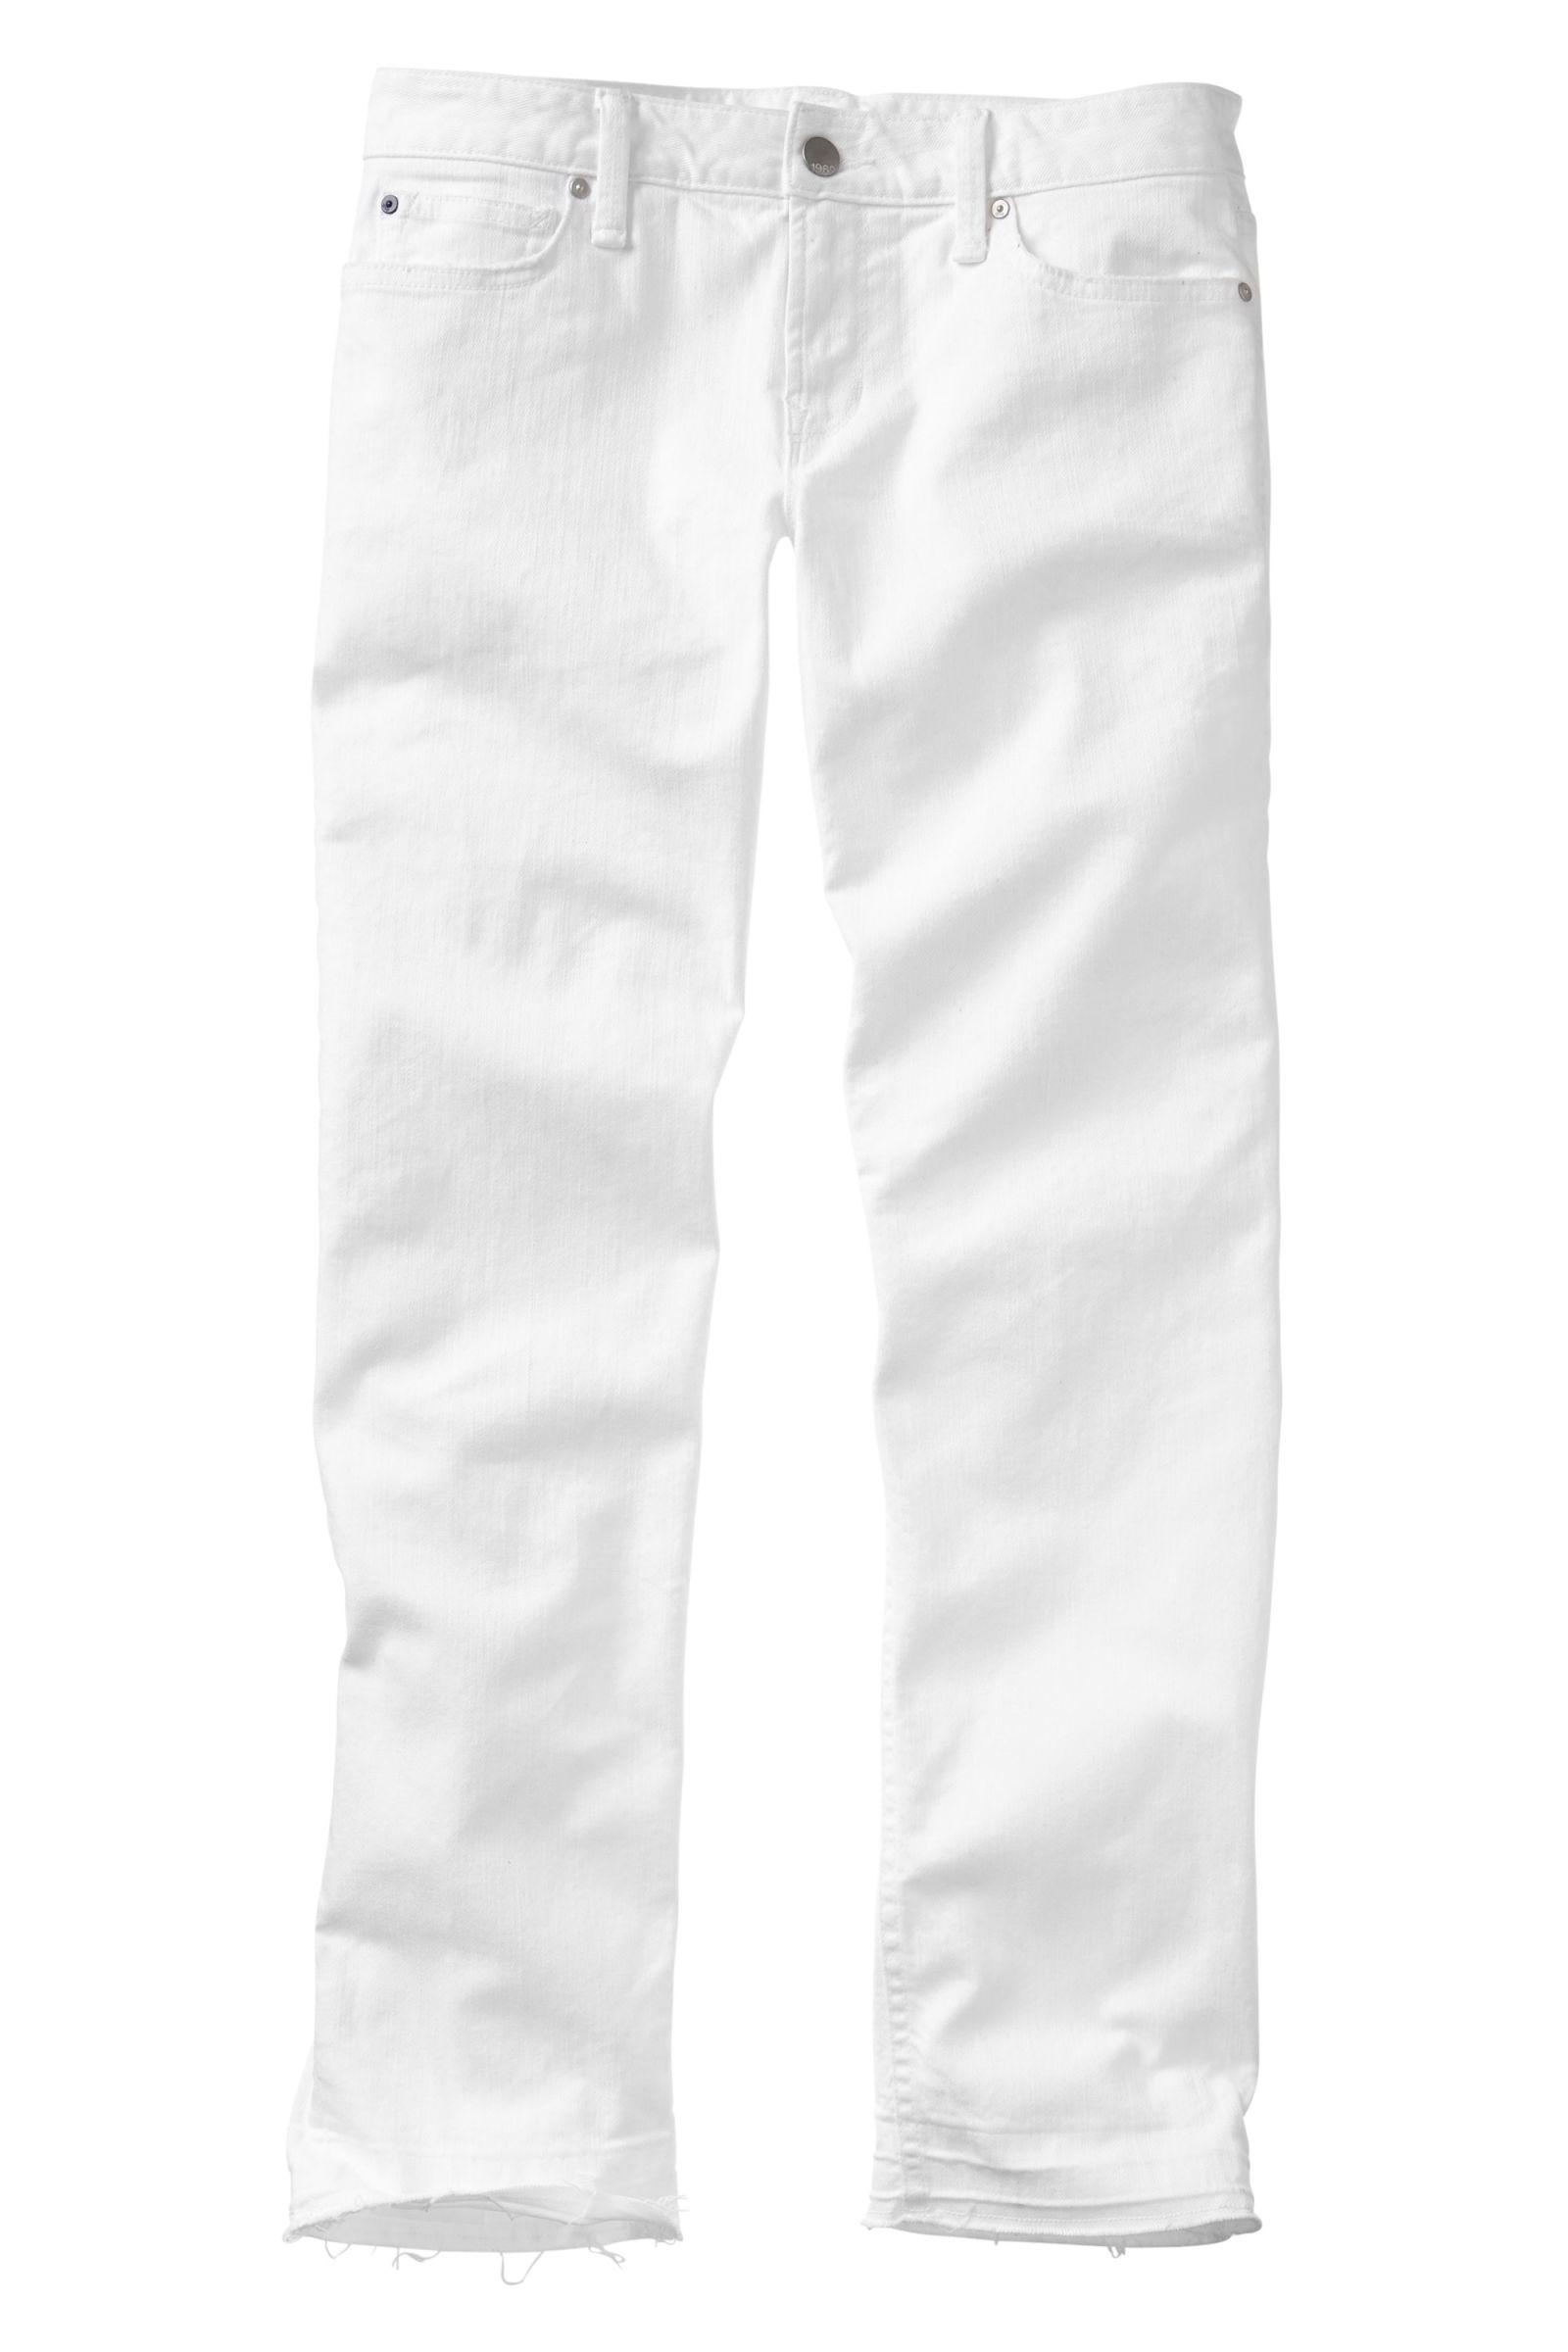 White Denim - Best White Jeans